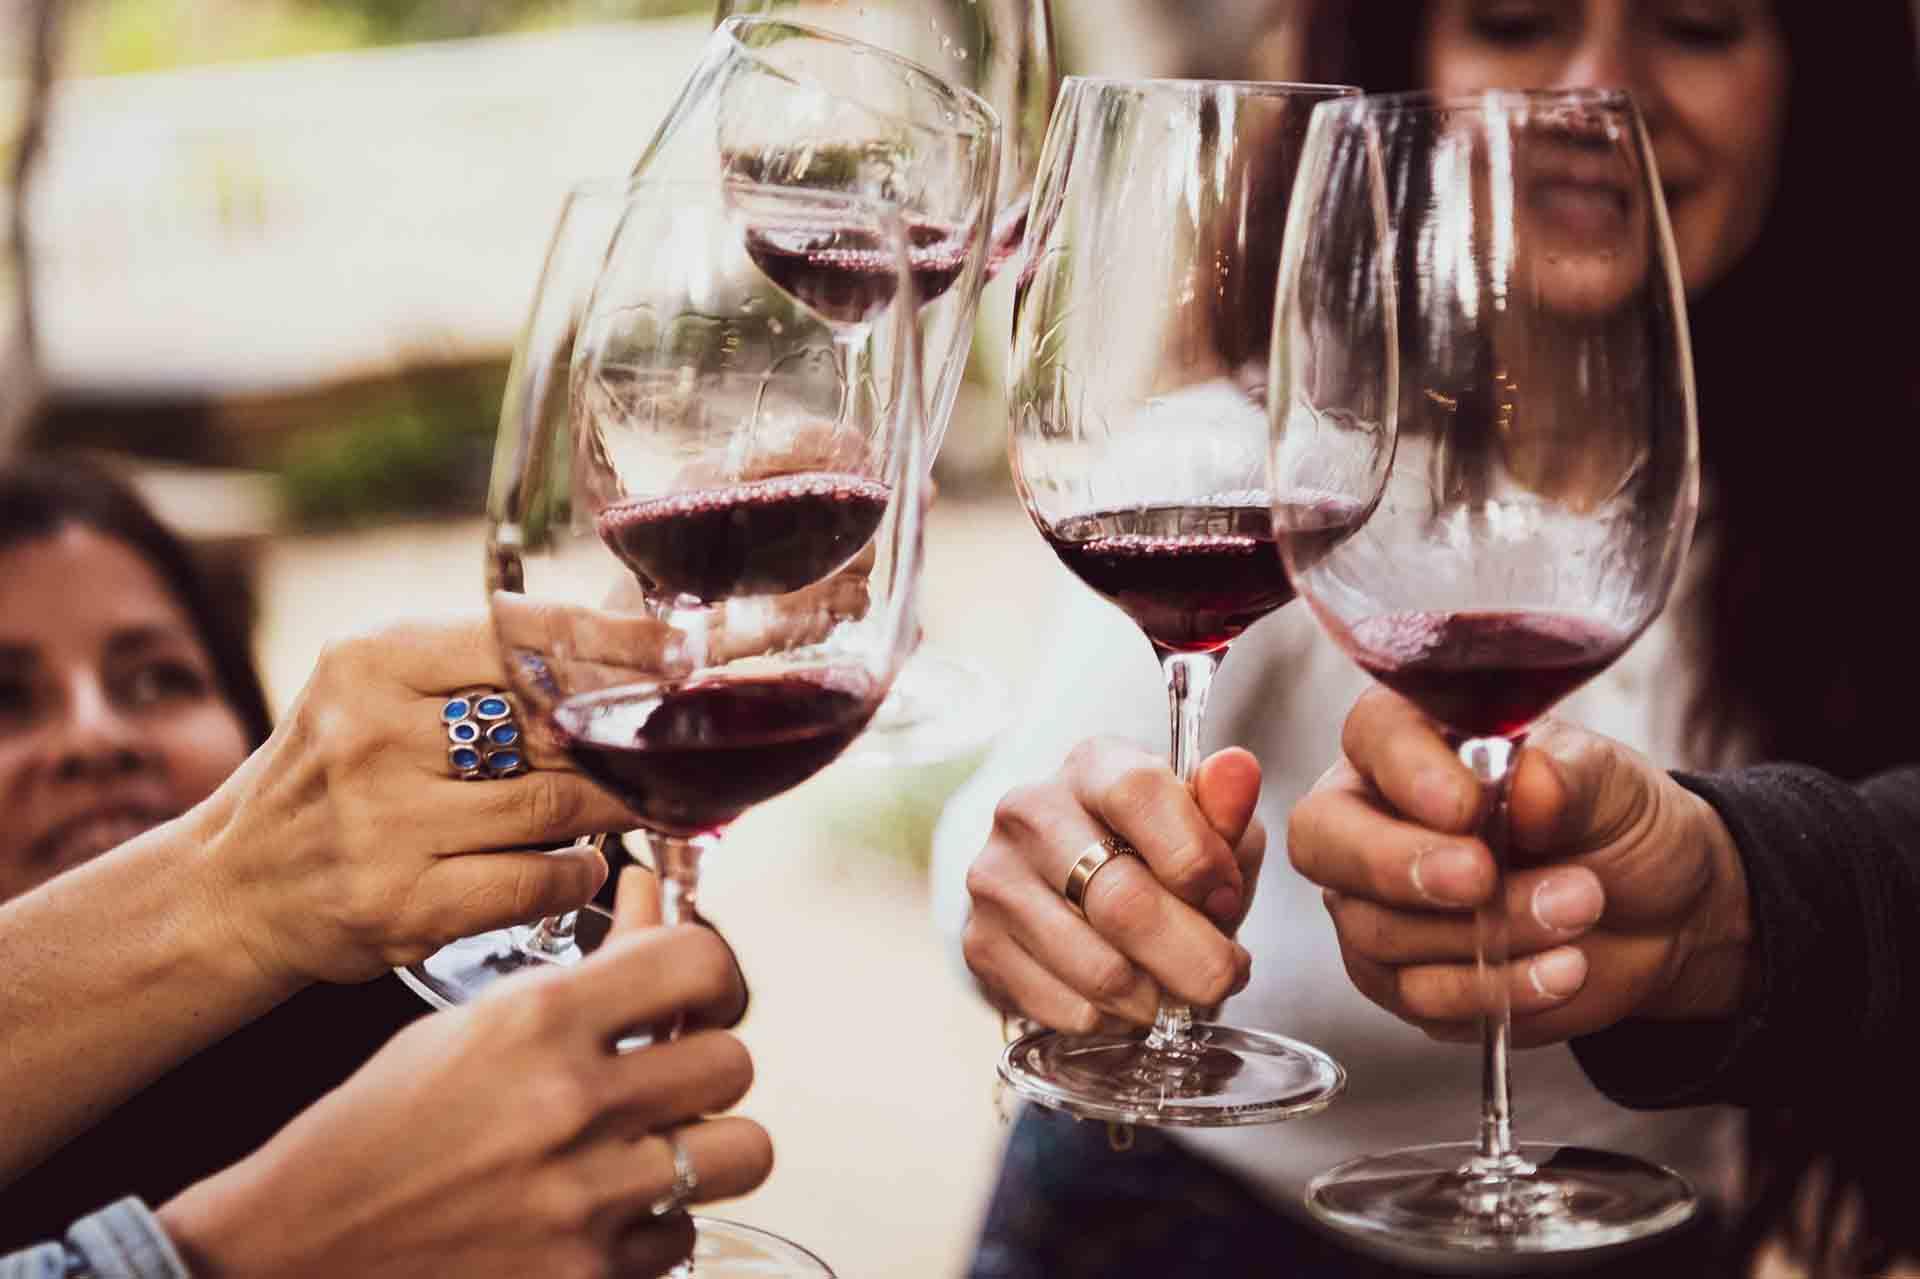 Friends enjoying wine tasting together